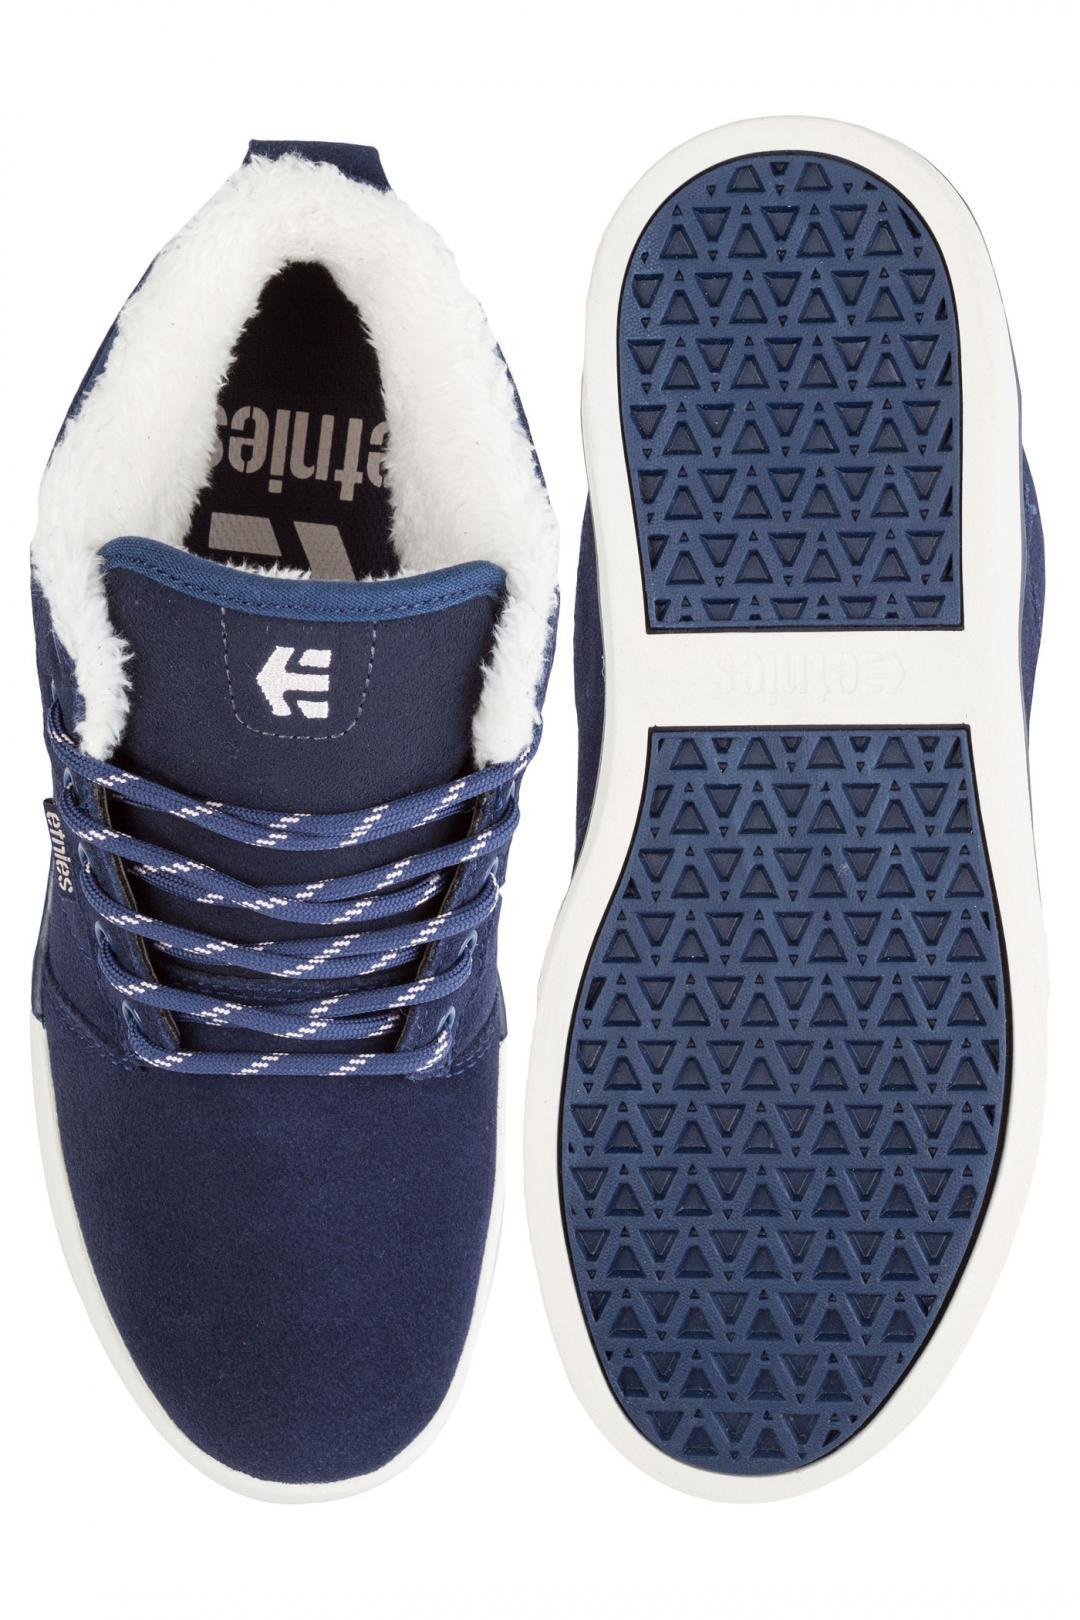 Donna Etnies Jefferson Mid navy | Sneaker